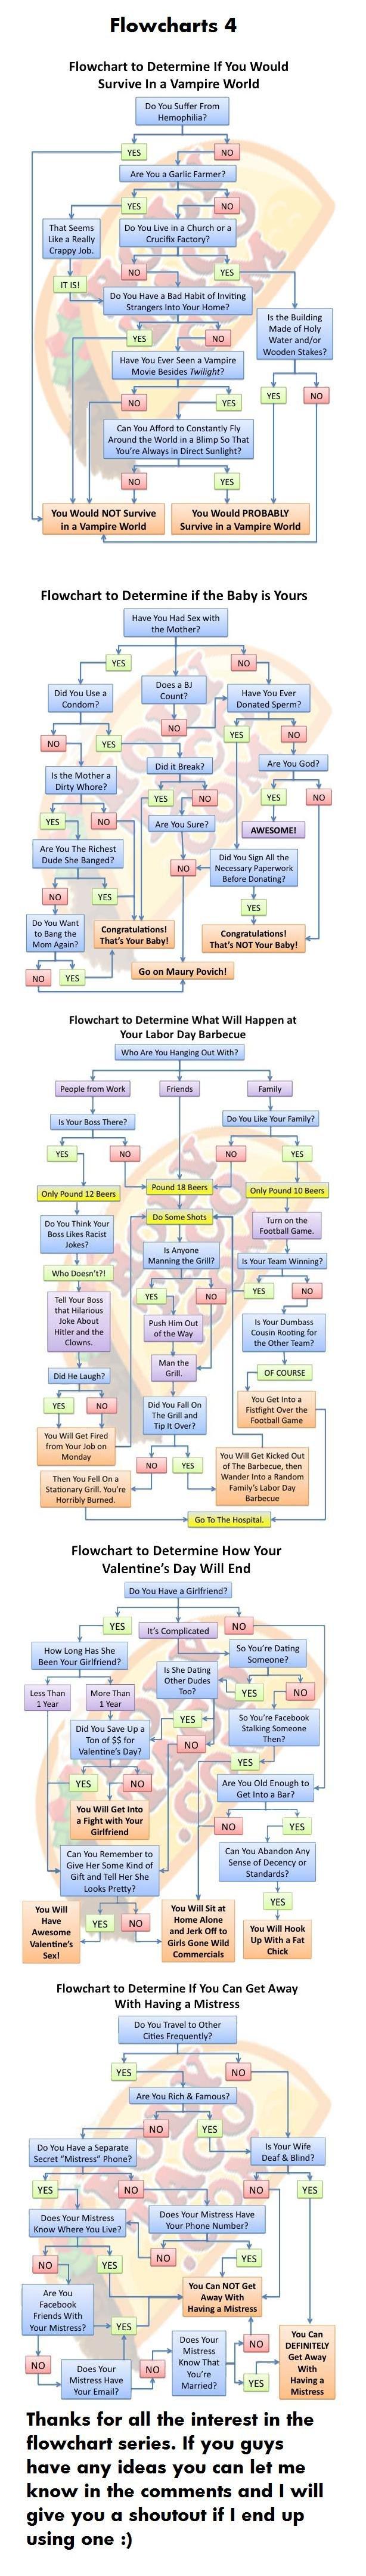 Flowcharts 4. OC Flowchart funnyjunk.com/funny_pictures/449098/OC+F lowchart/<br /> Part 1 funnyjunk.com/funny_pictures/442072/Flowcharts/<br /> Par holytaco flowcharts